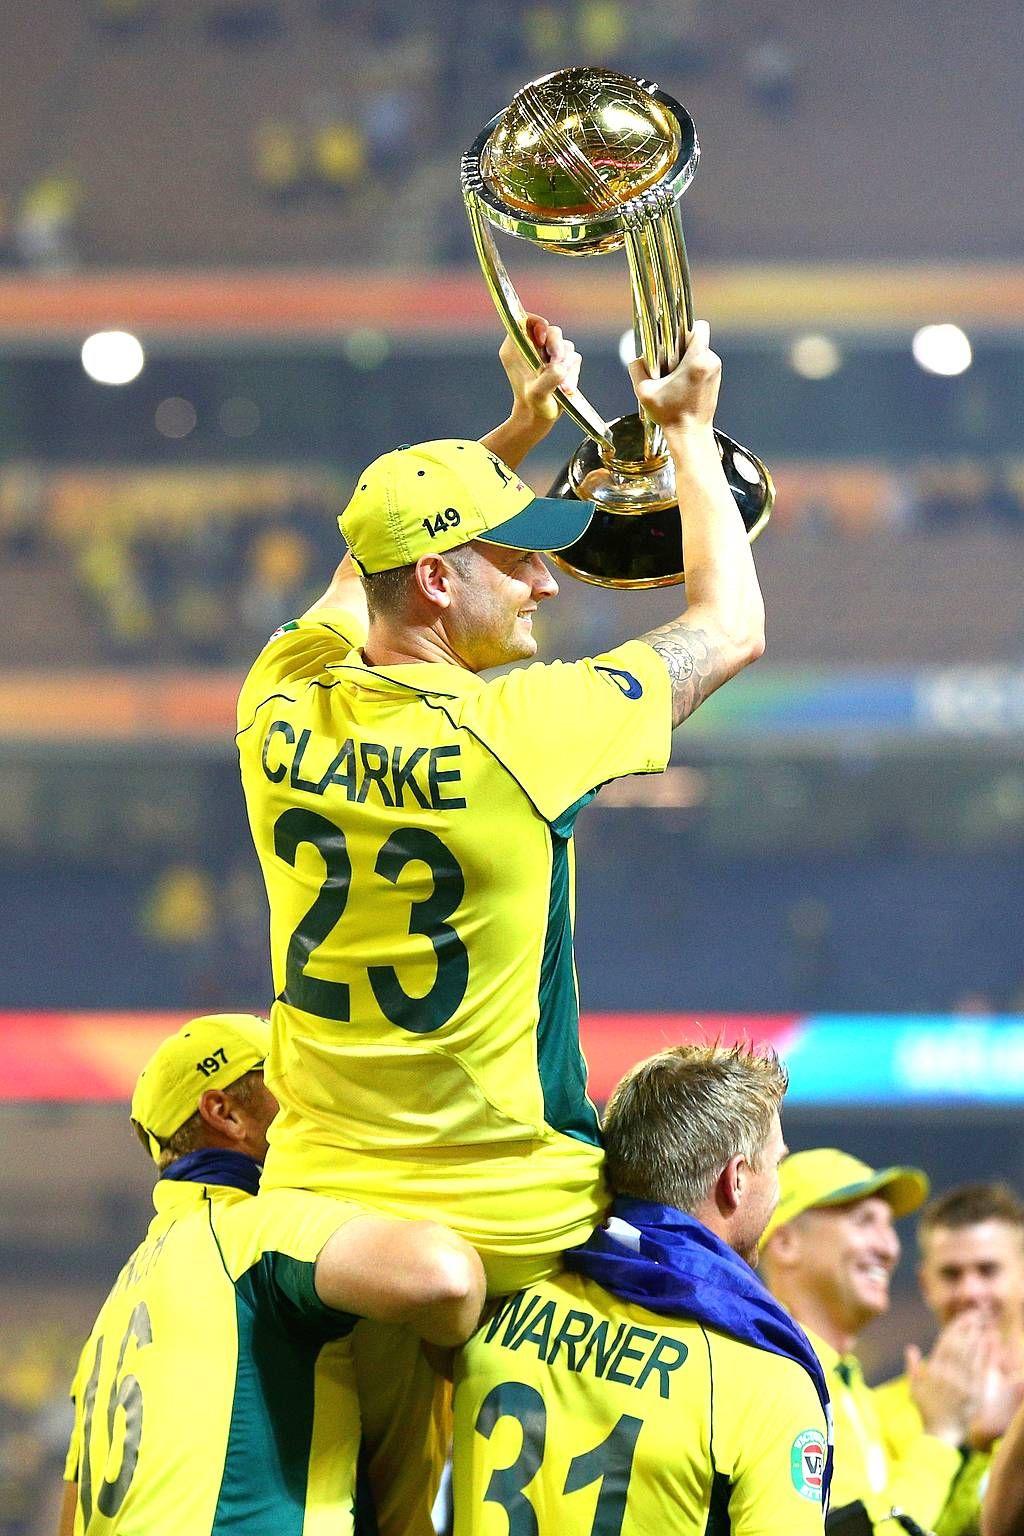 Australia S World Cup Triumph Celebrations March 29 2015 Australia Cricket Team Cricket World Cup World Cricket